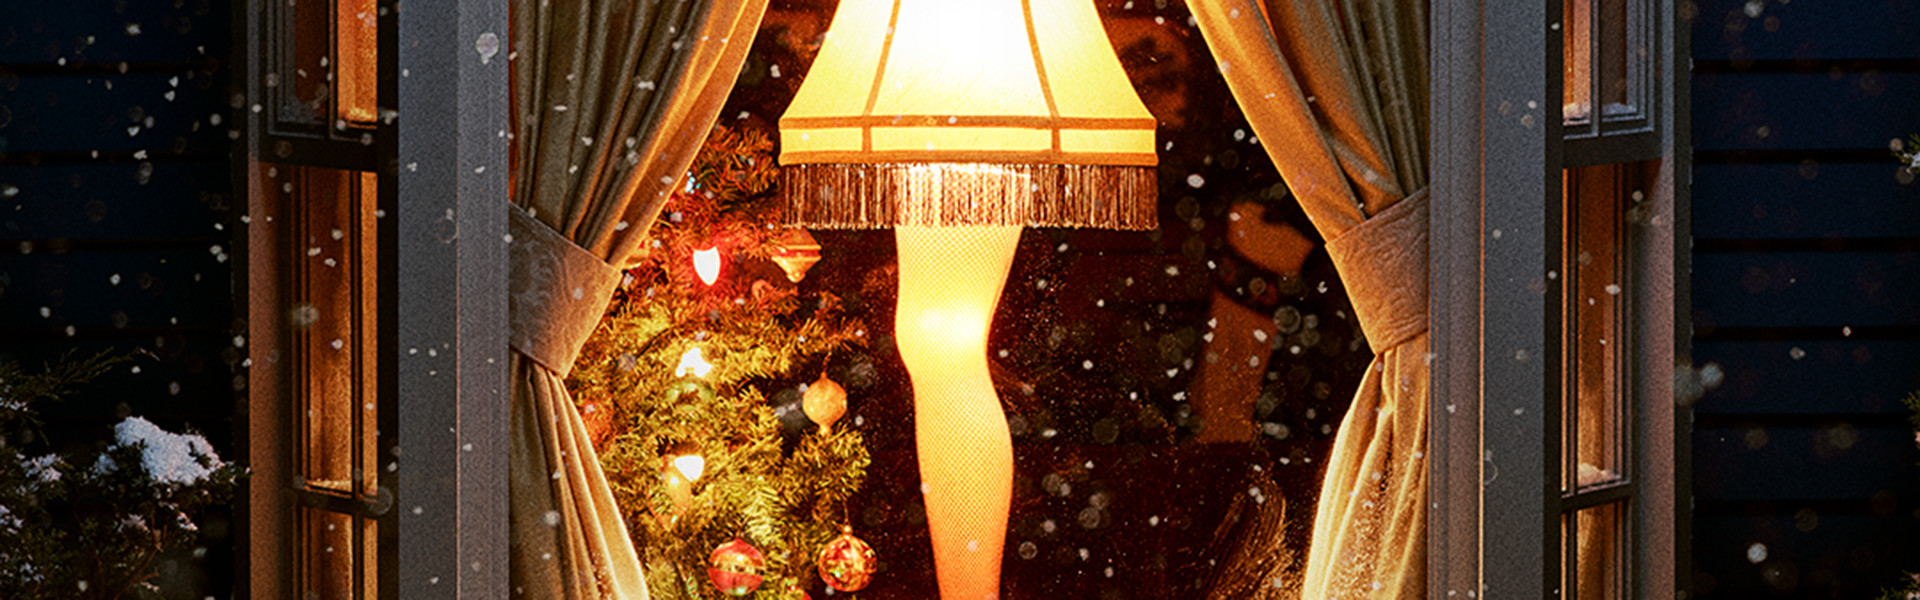 20 Christmas Story Leg Lamp  Fox to Construct 20 Foot Leg Lamp for 'A Christmas Story